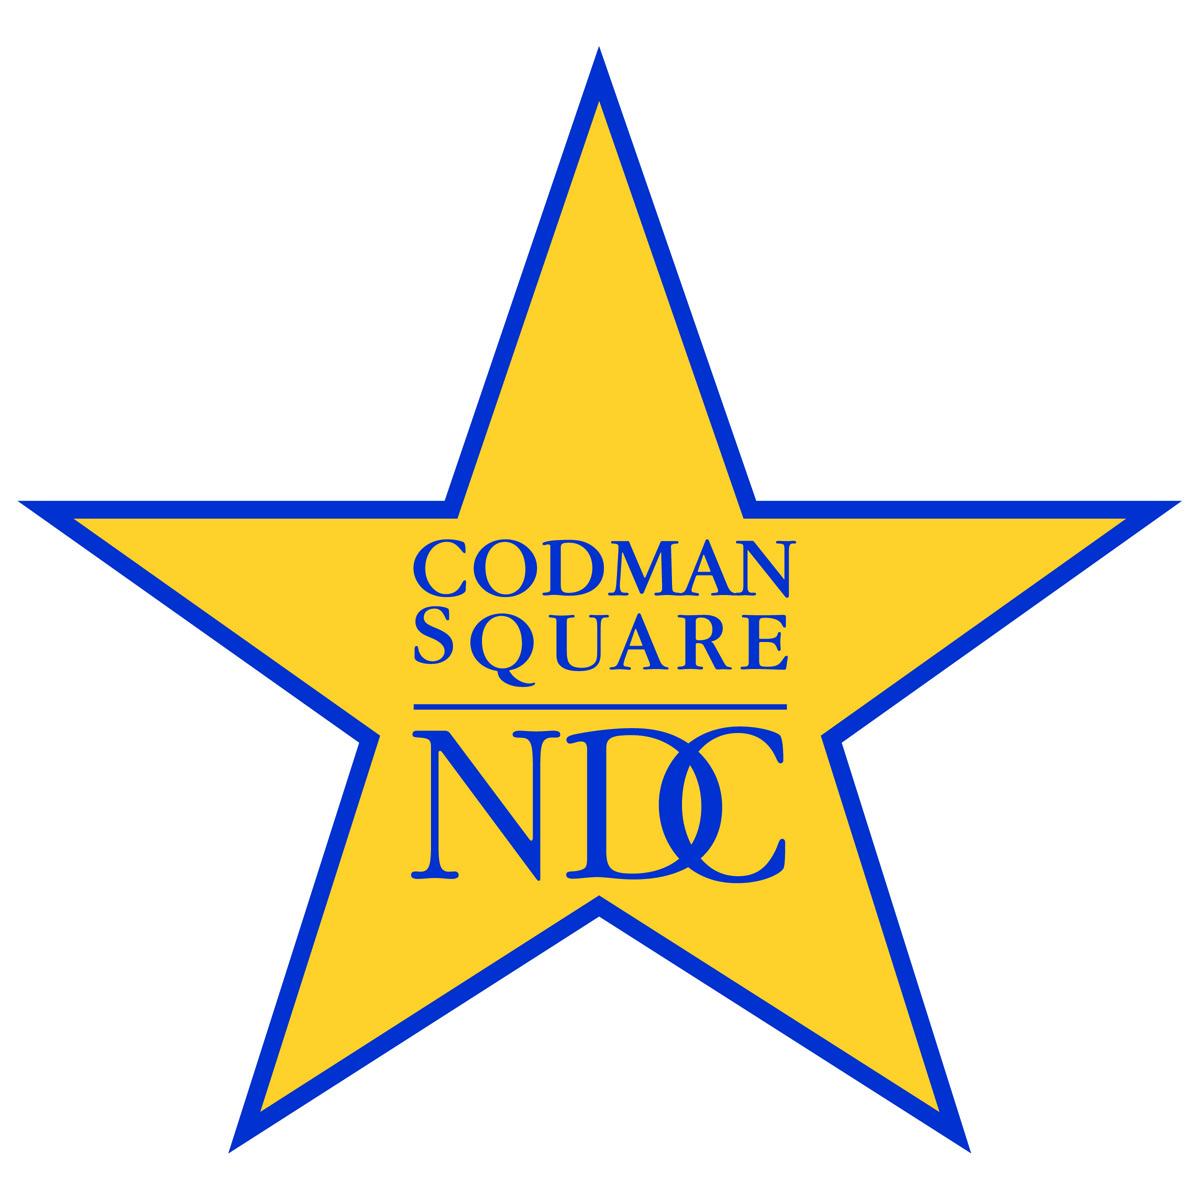 Codman Sq NDC